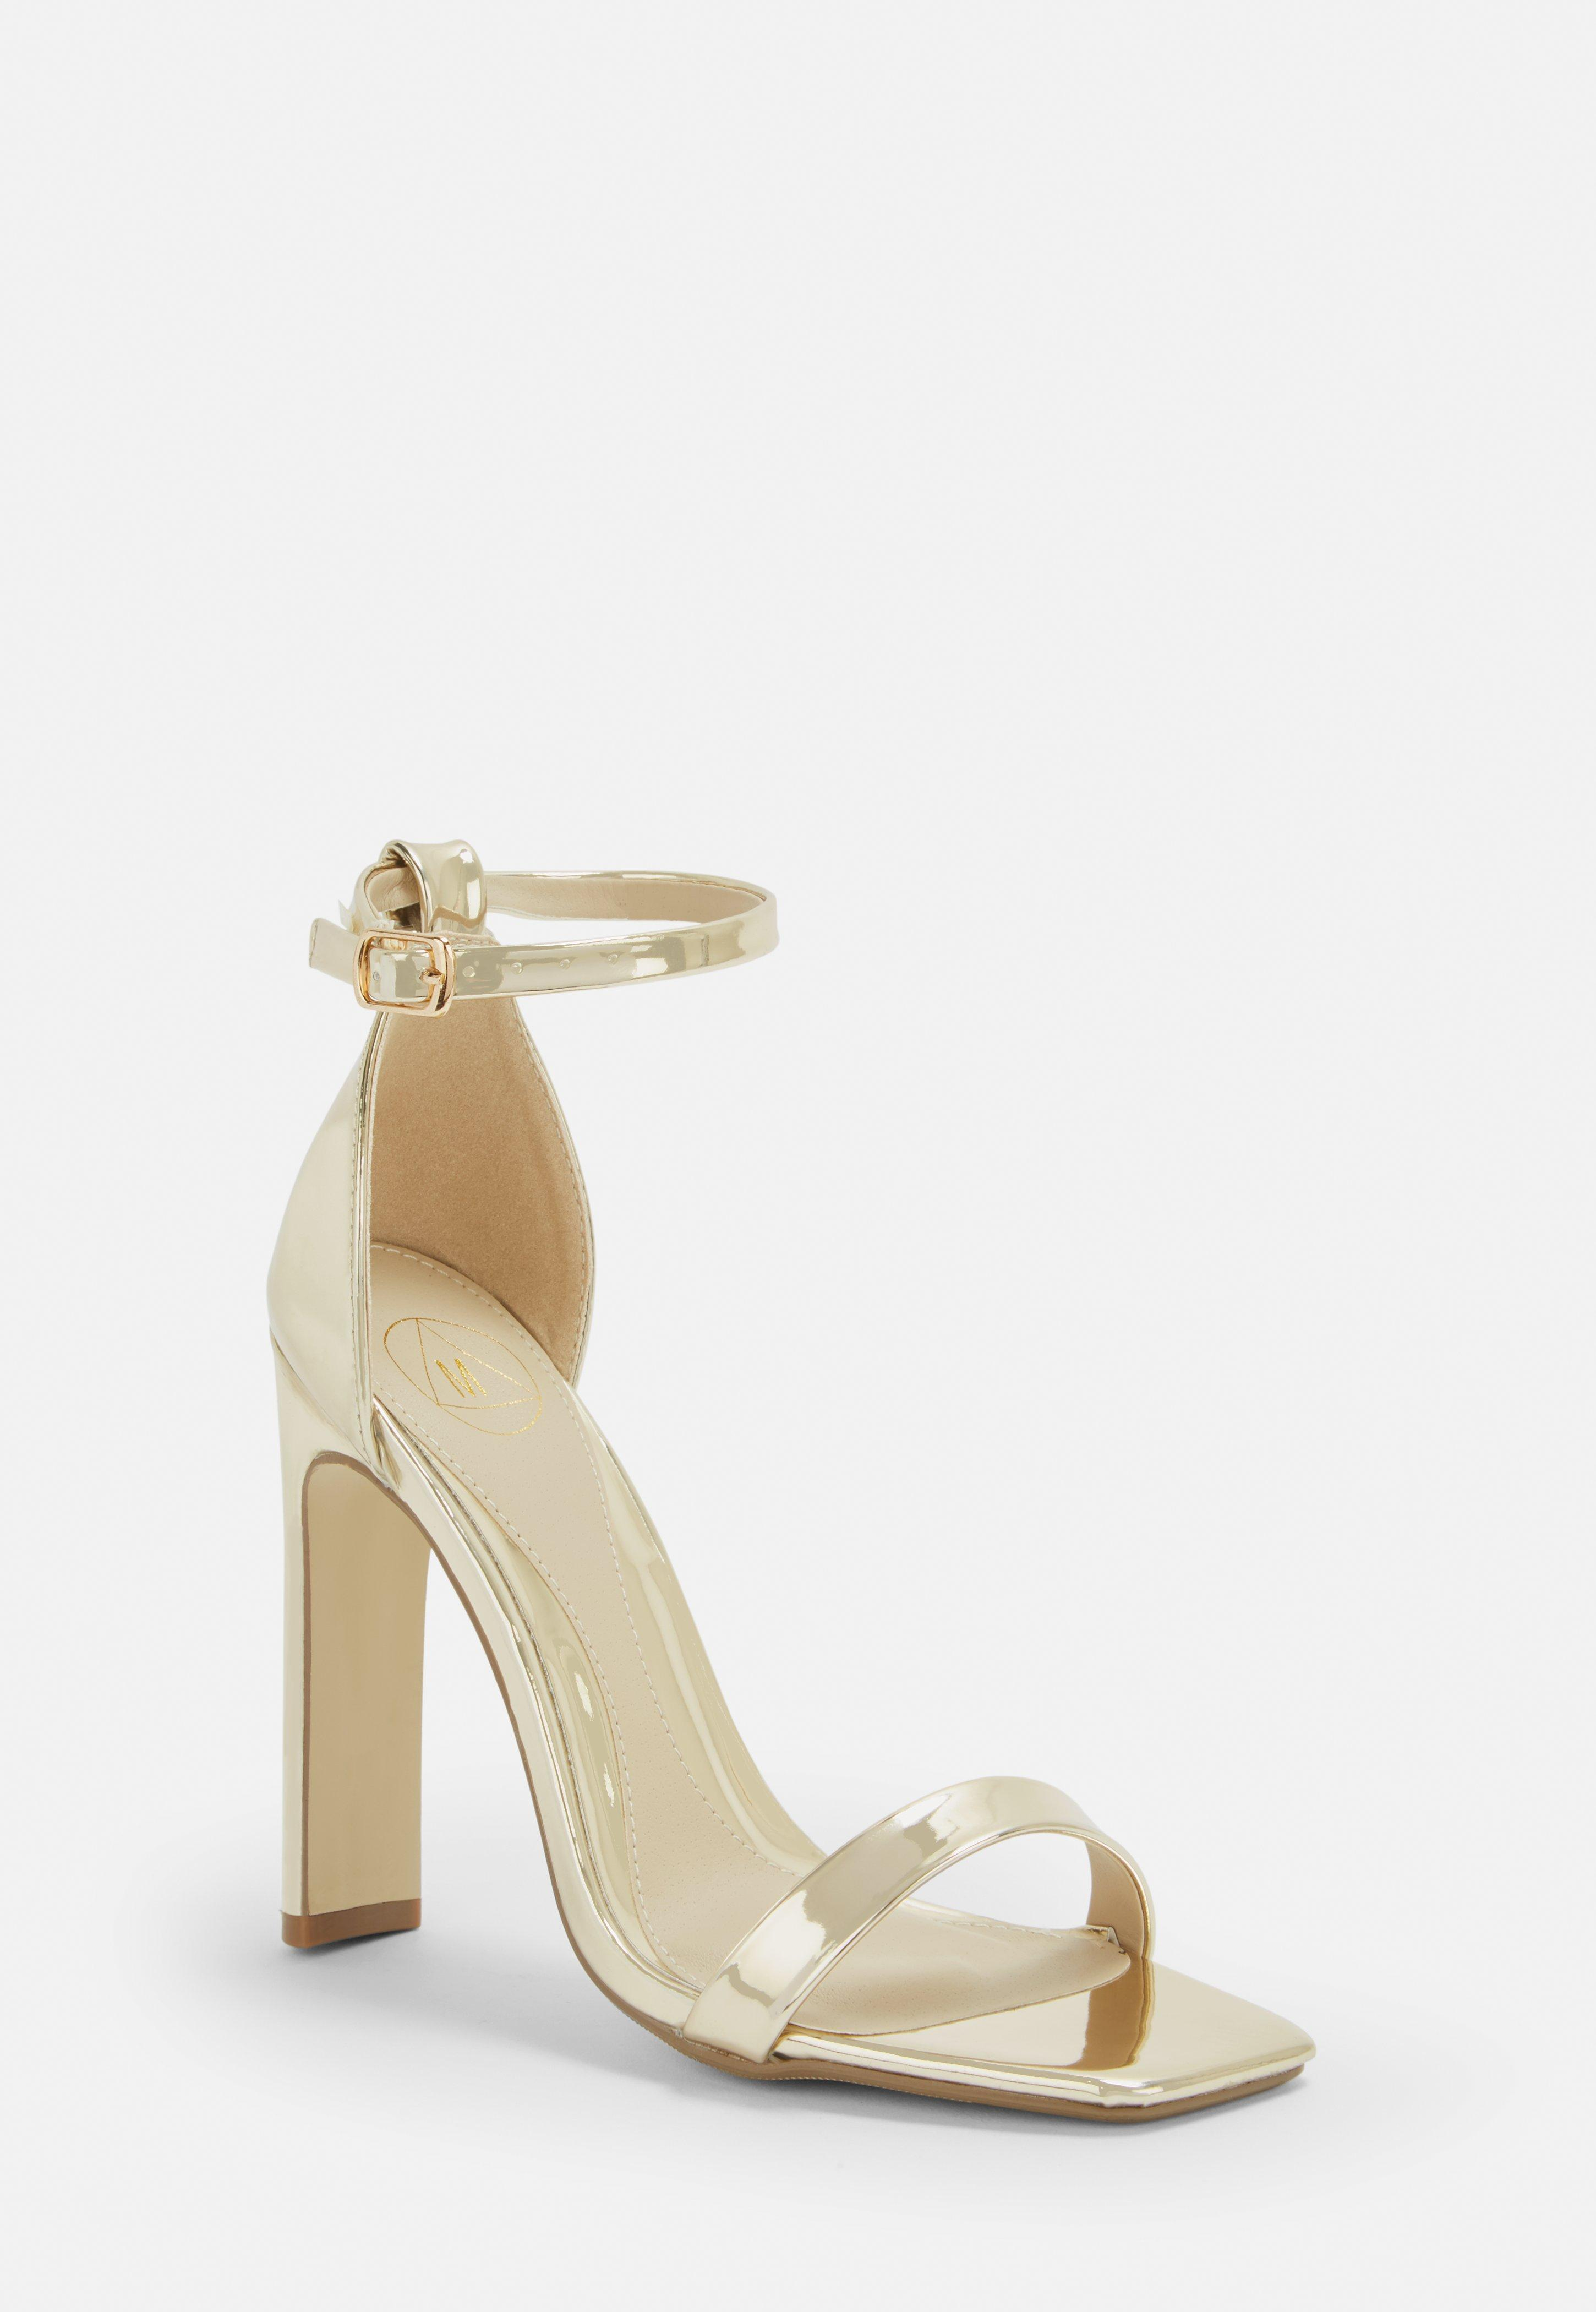 Six inch killer heels hit the high street